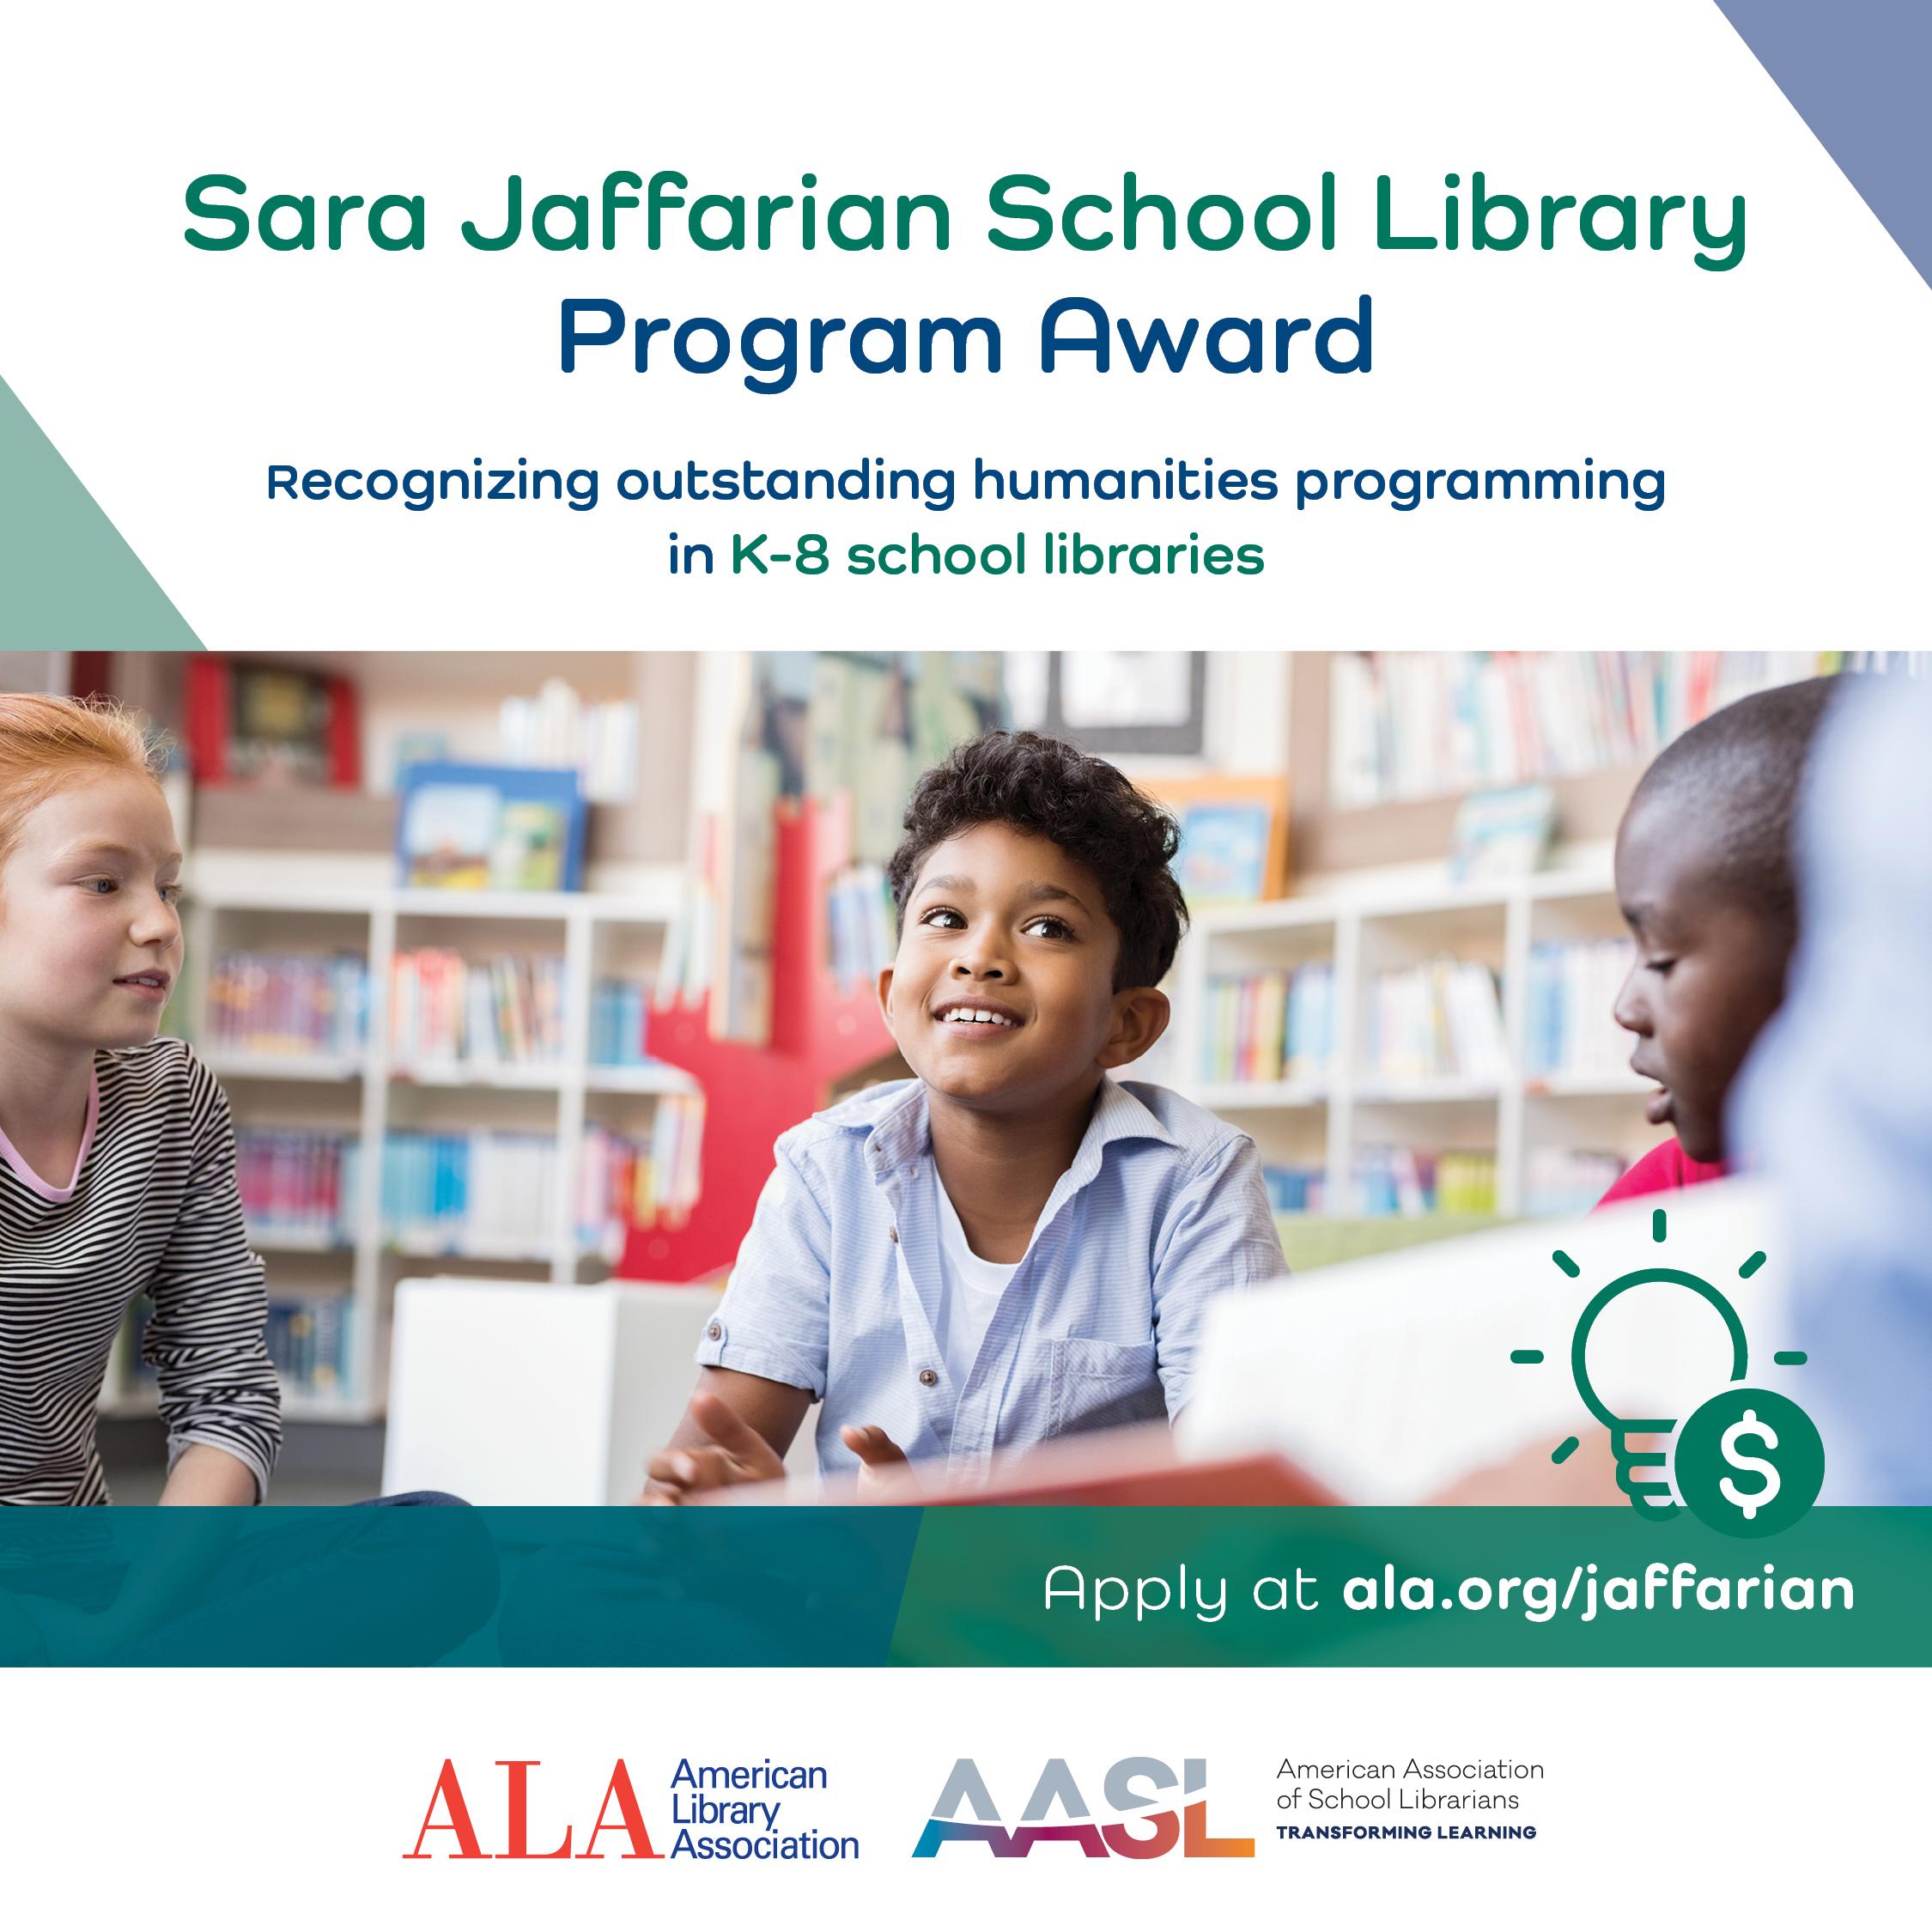 Sara Jaffarian School Library Program Award. Recognizing outstanding humanities programming in K-8 school libraries. Apply at ala.org/jaffarian